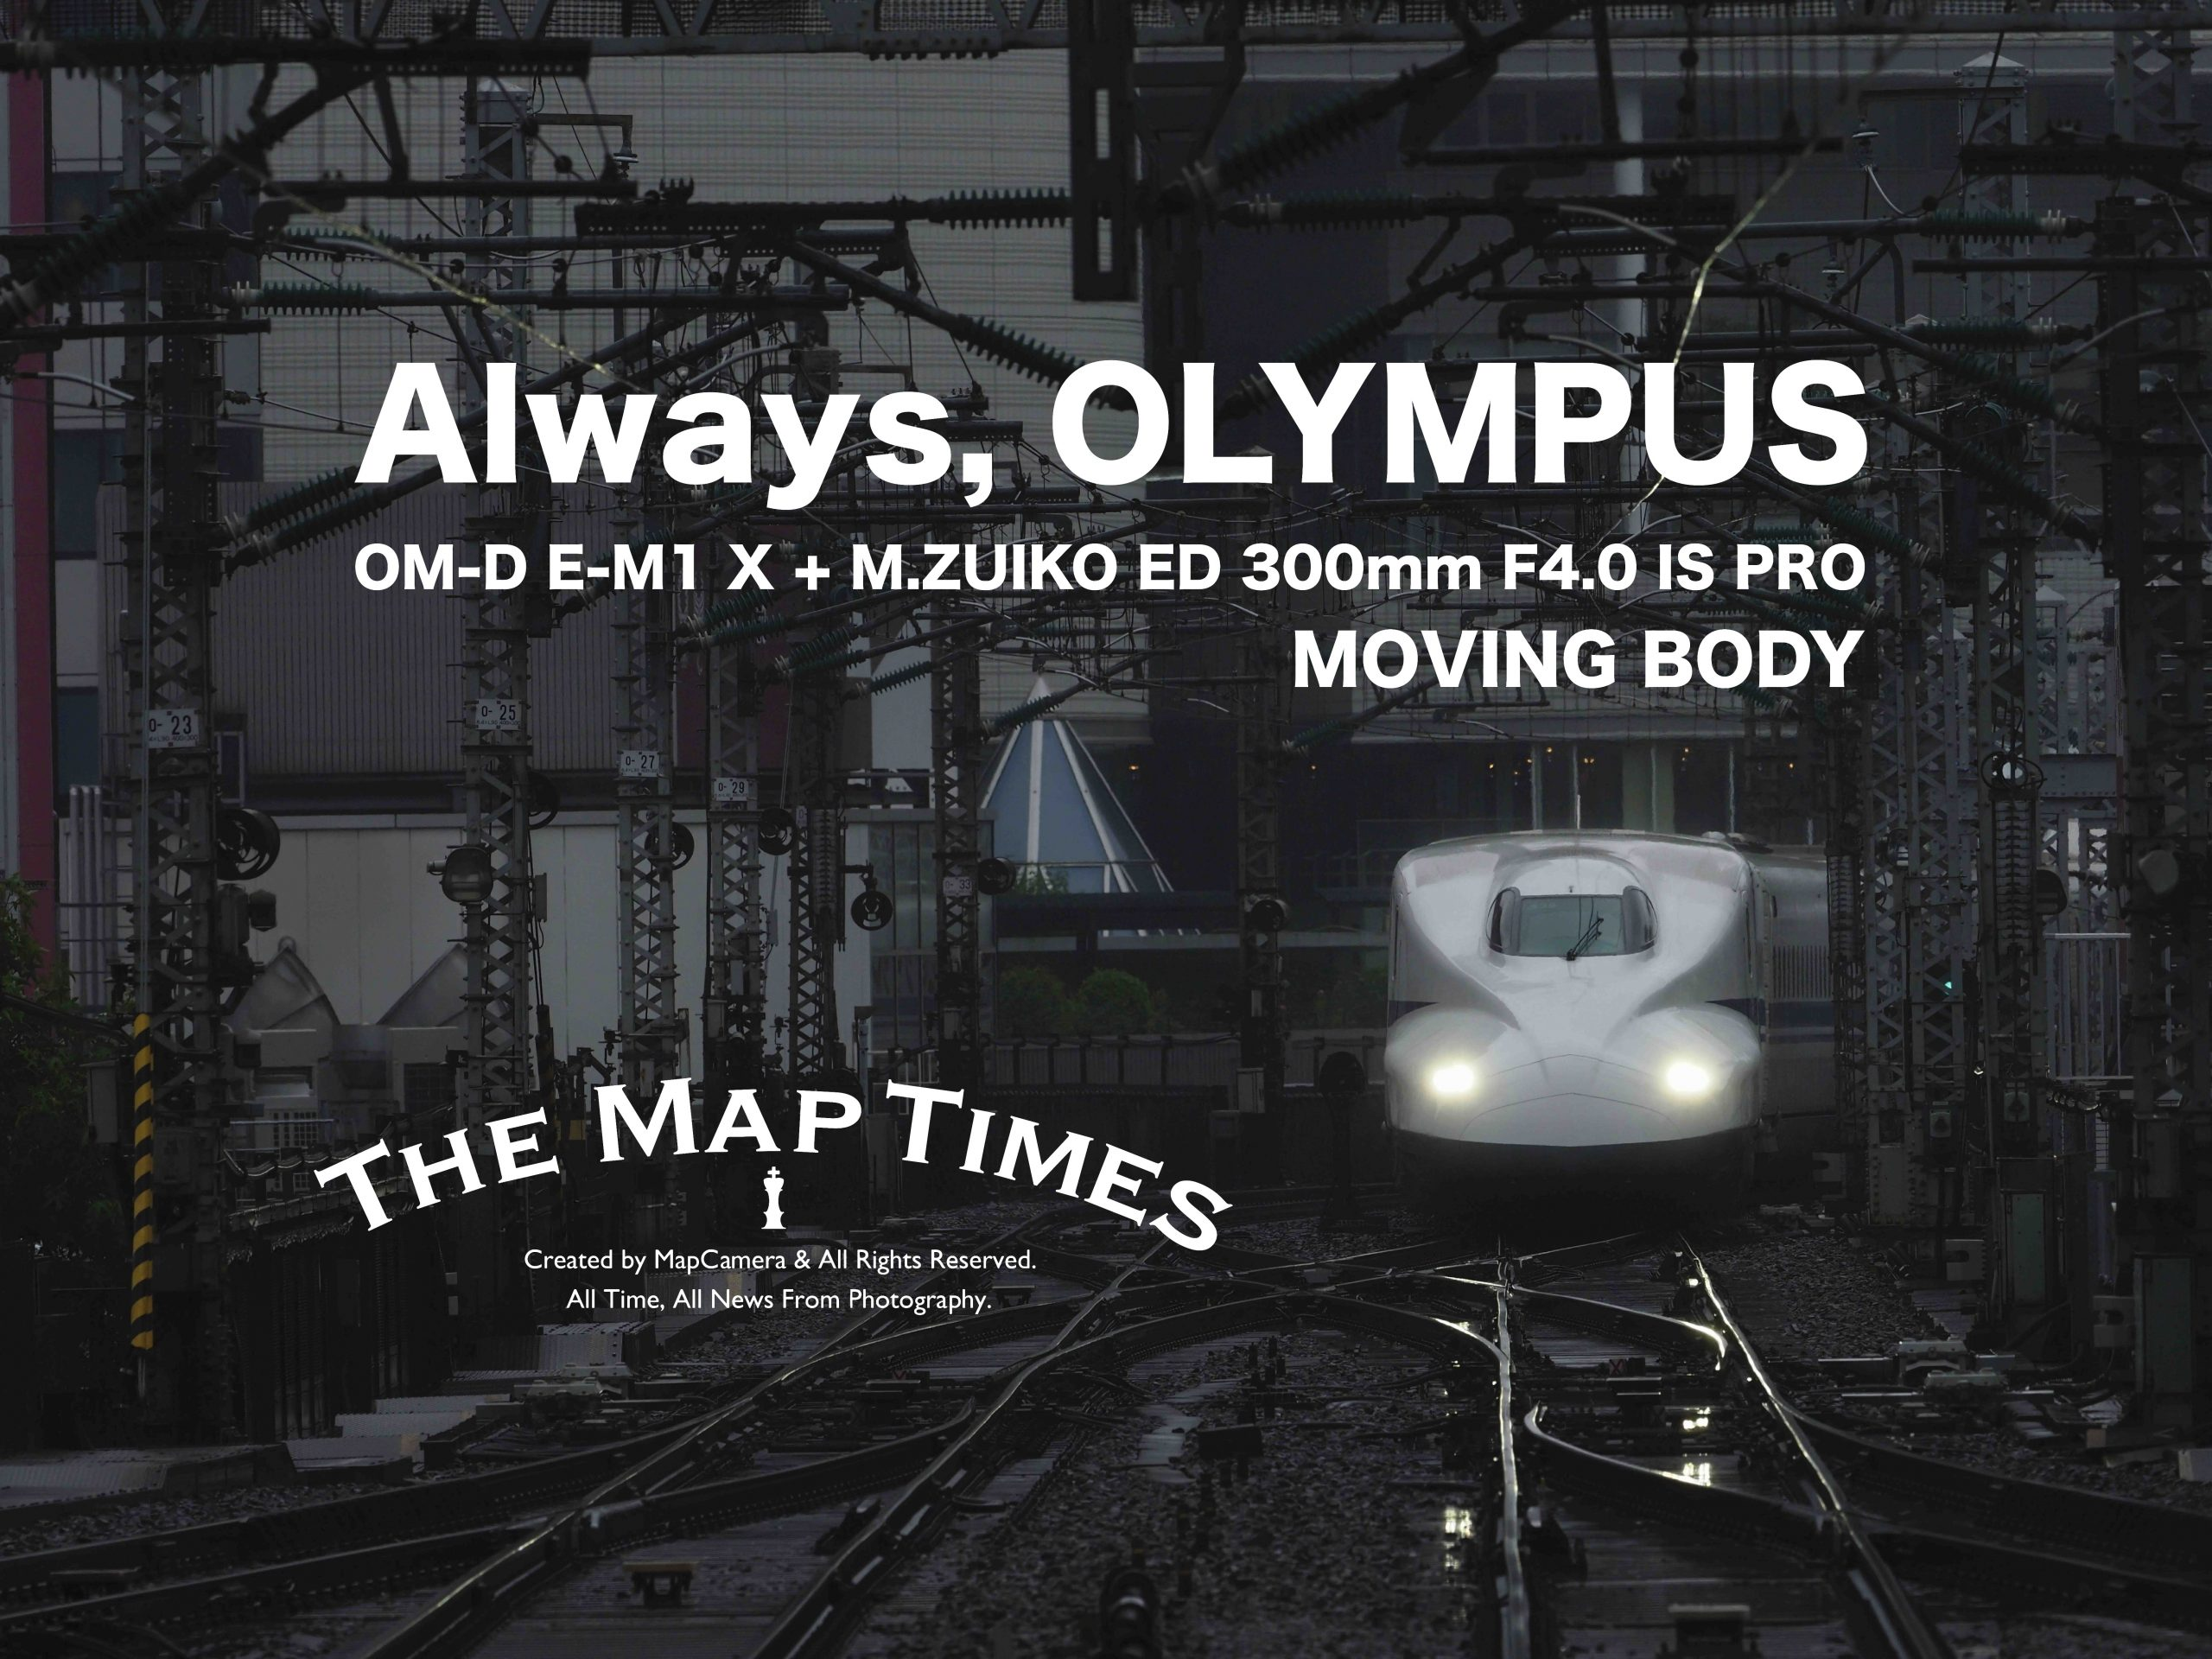 【OLYMPUS】Always, OLYMPUS Ver. OM-D E-M1X